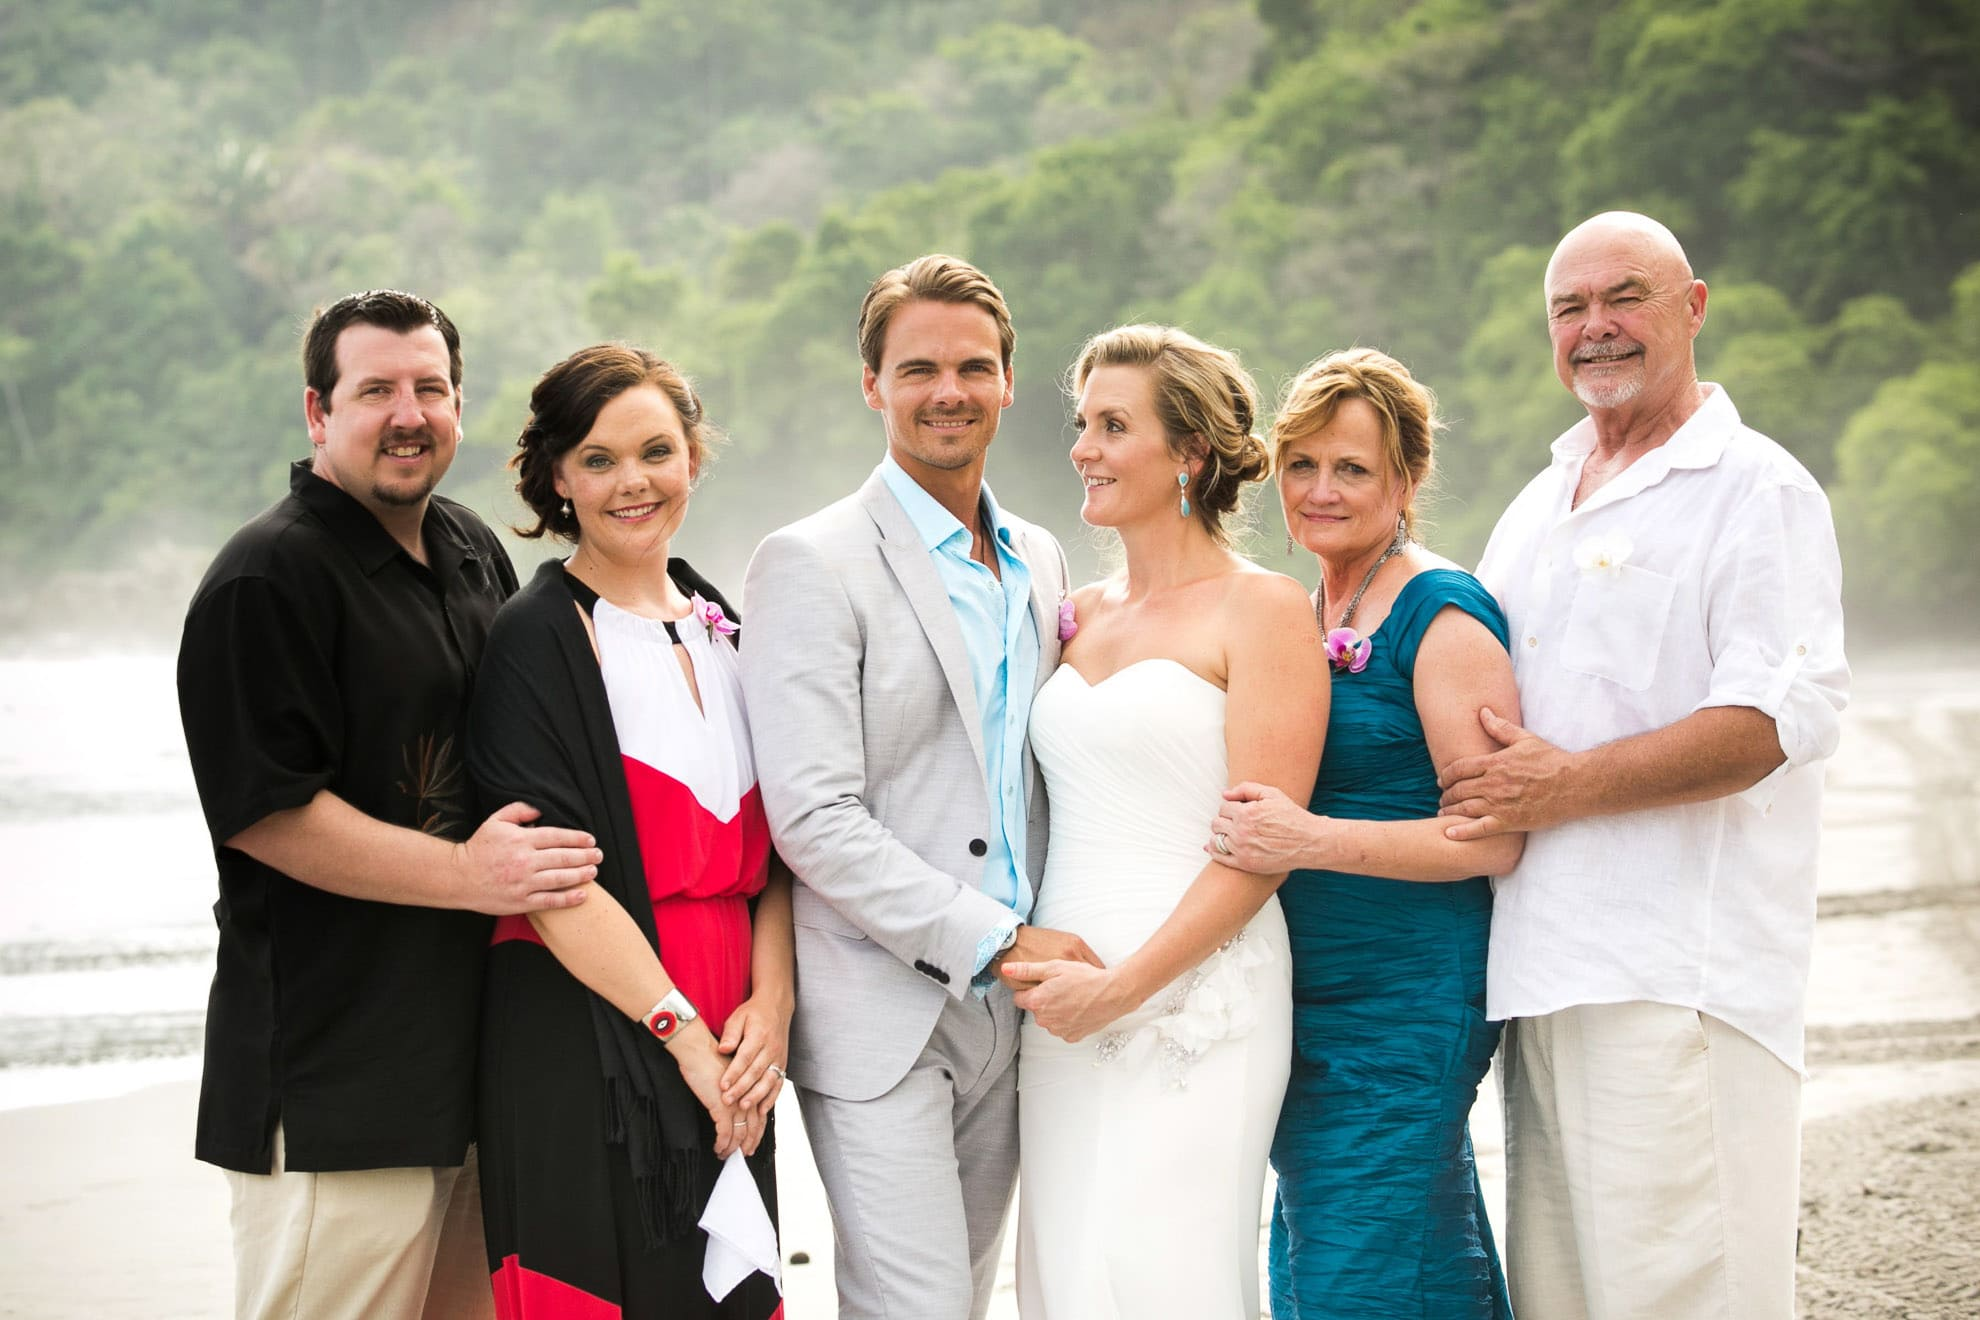 family portraits at destination wedding in Costa Rica